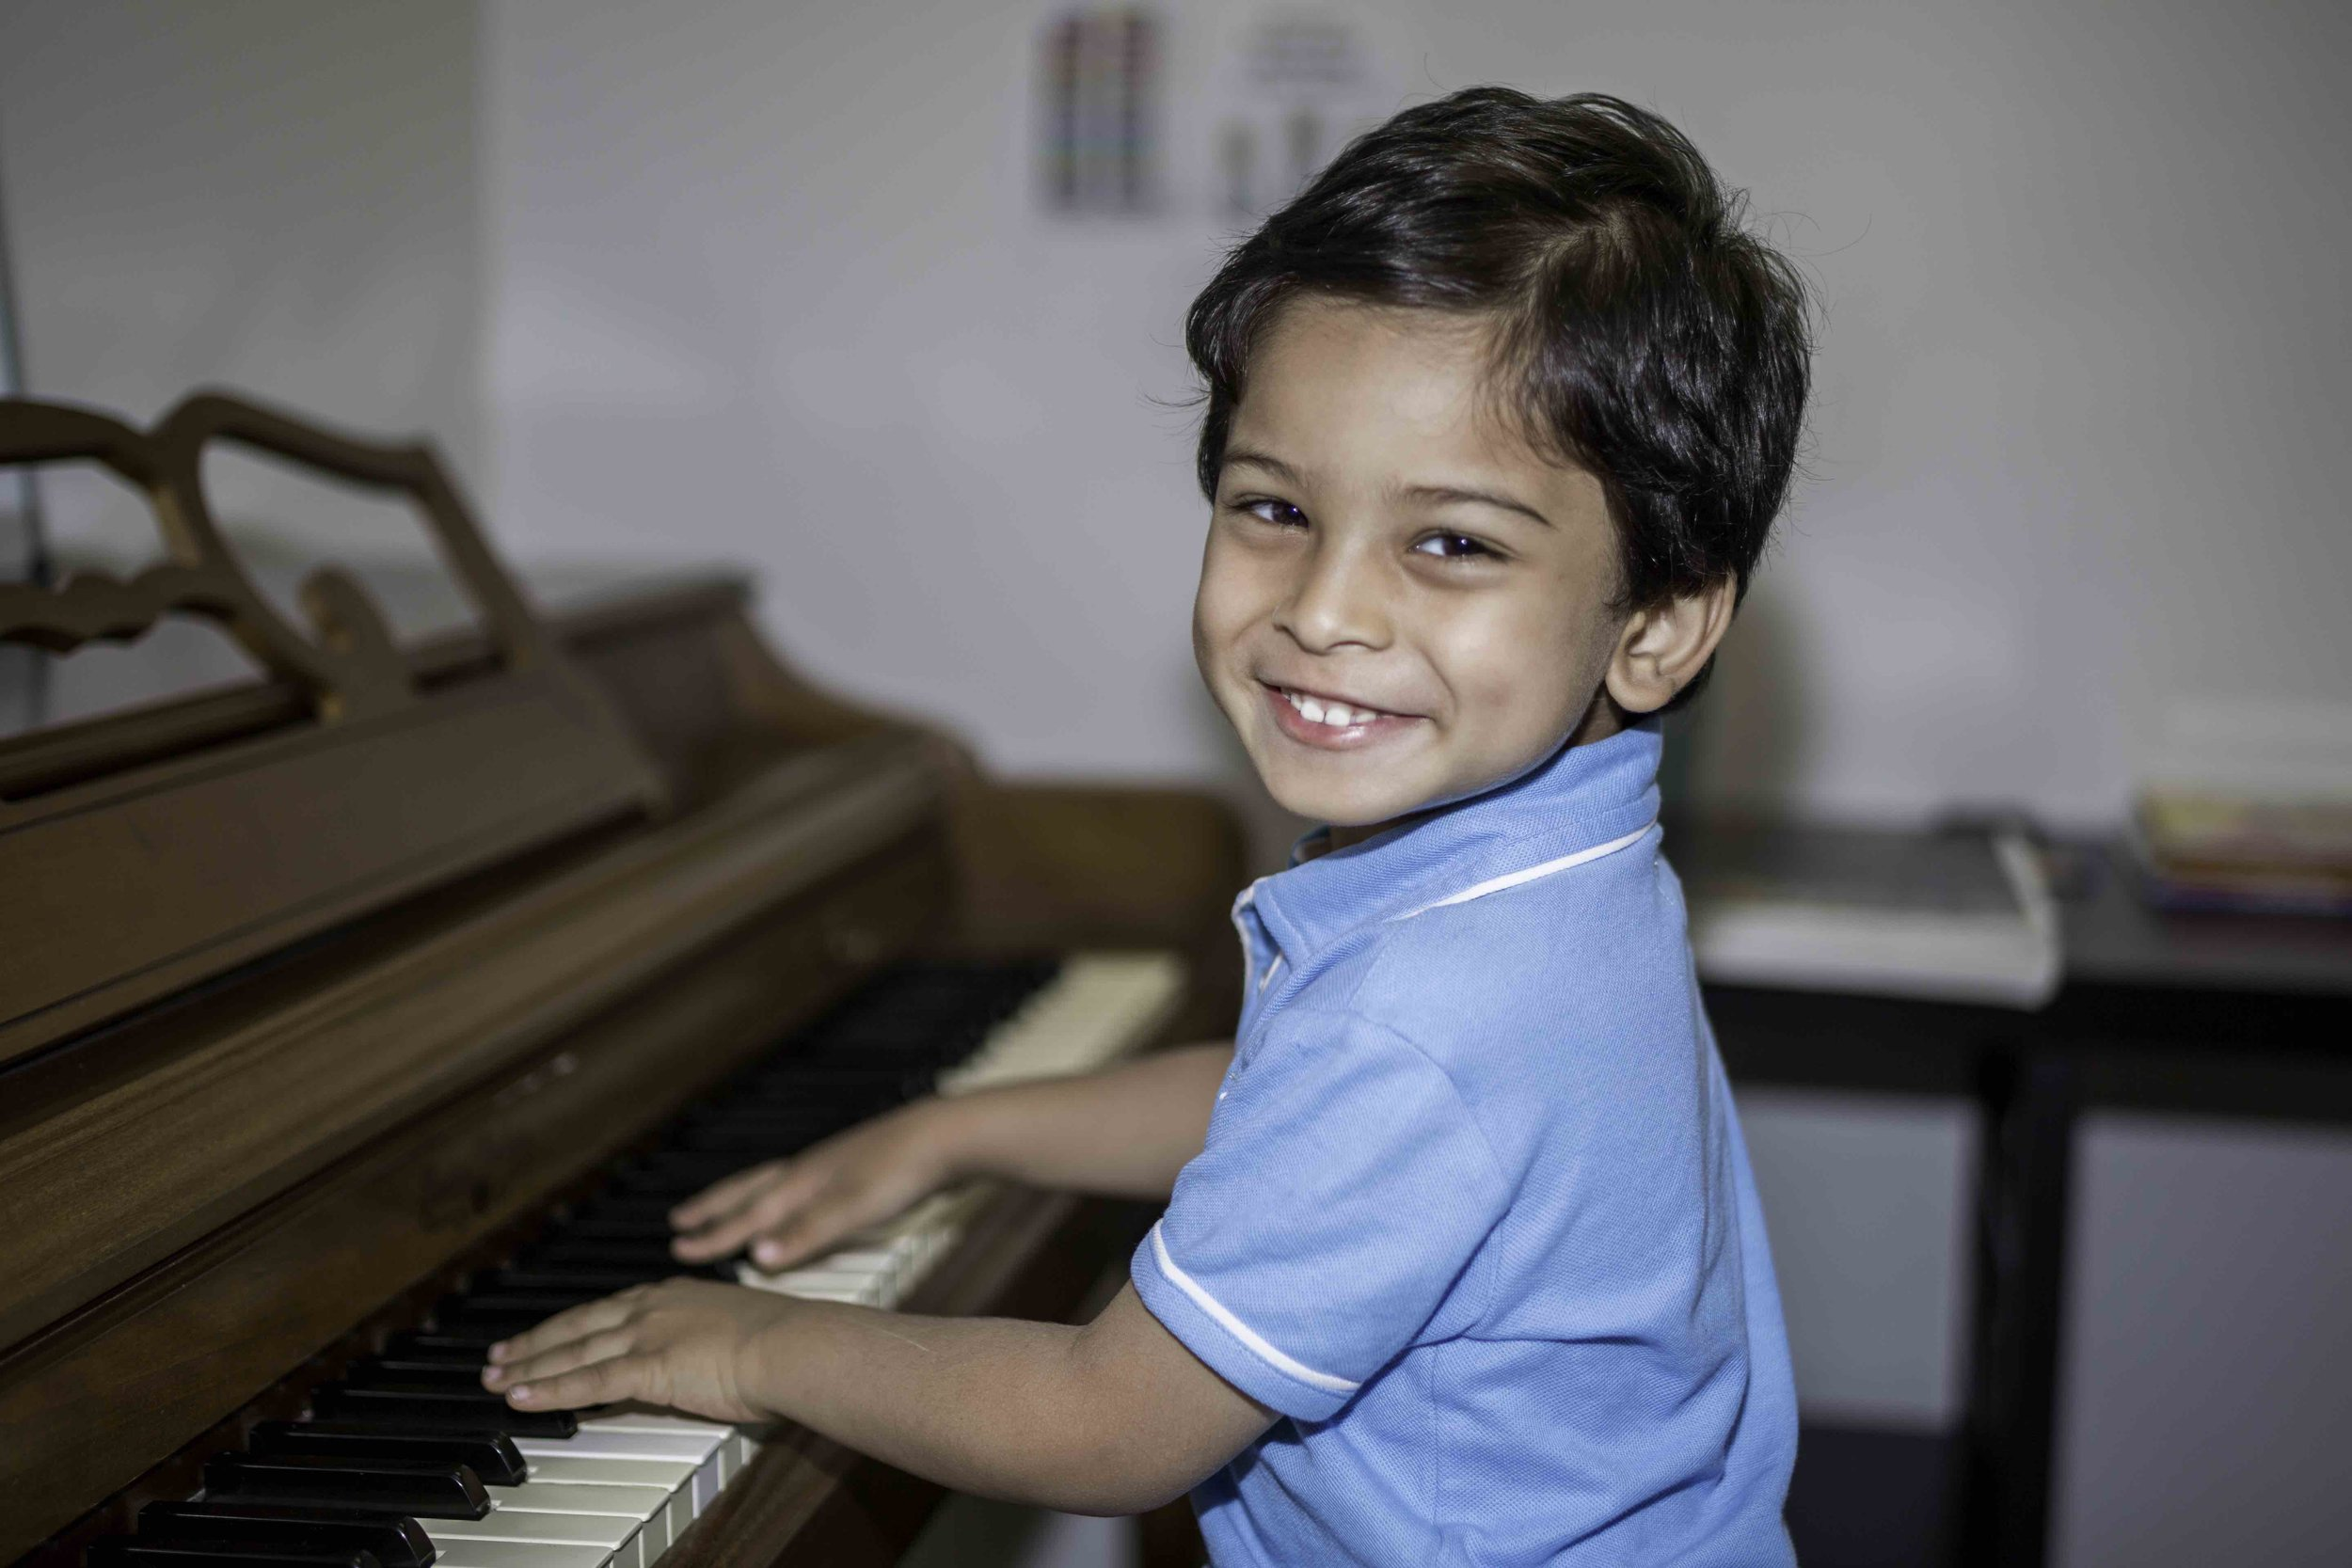 Indian Boy Piano small.jpg